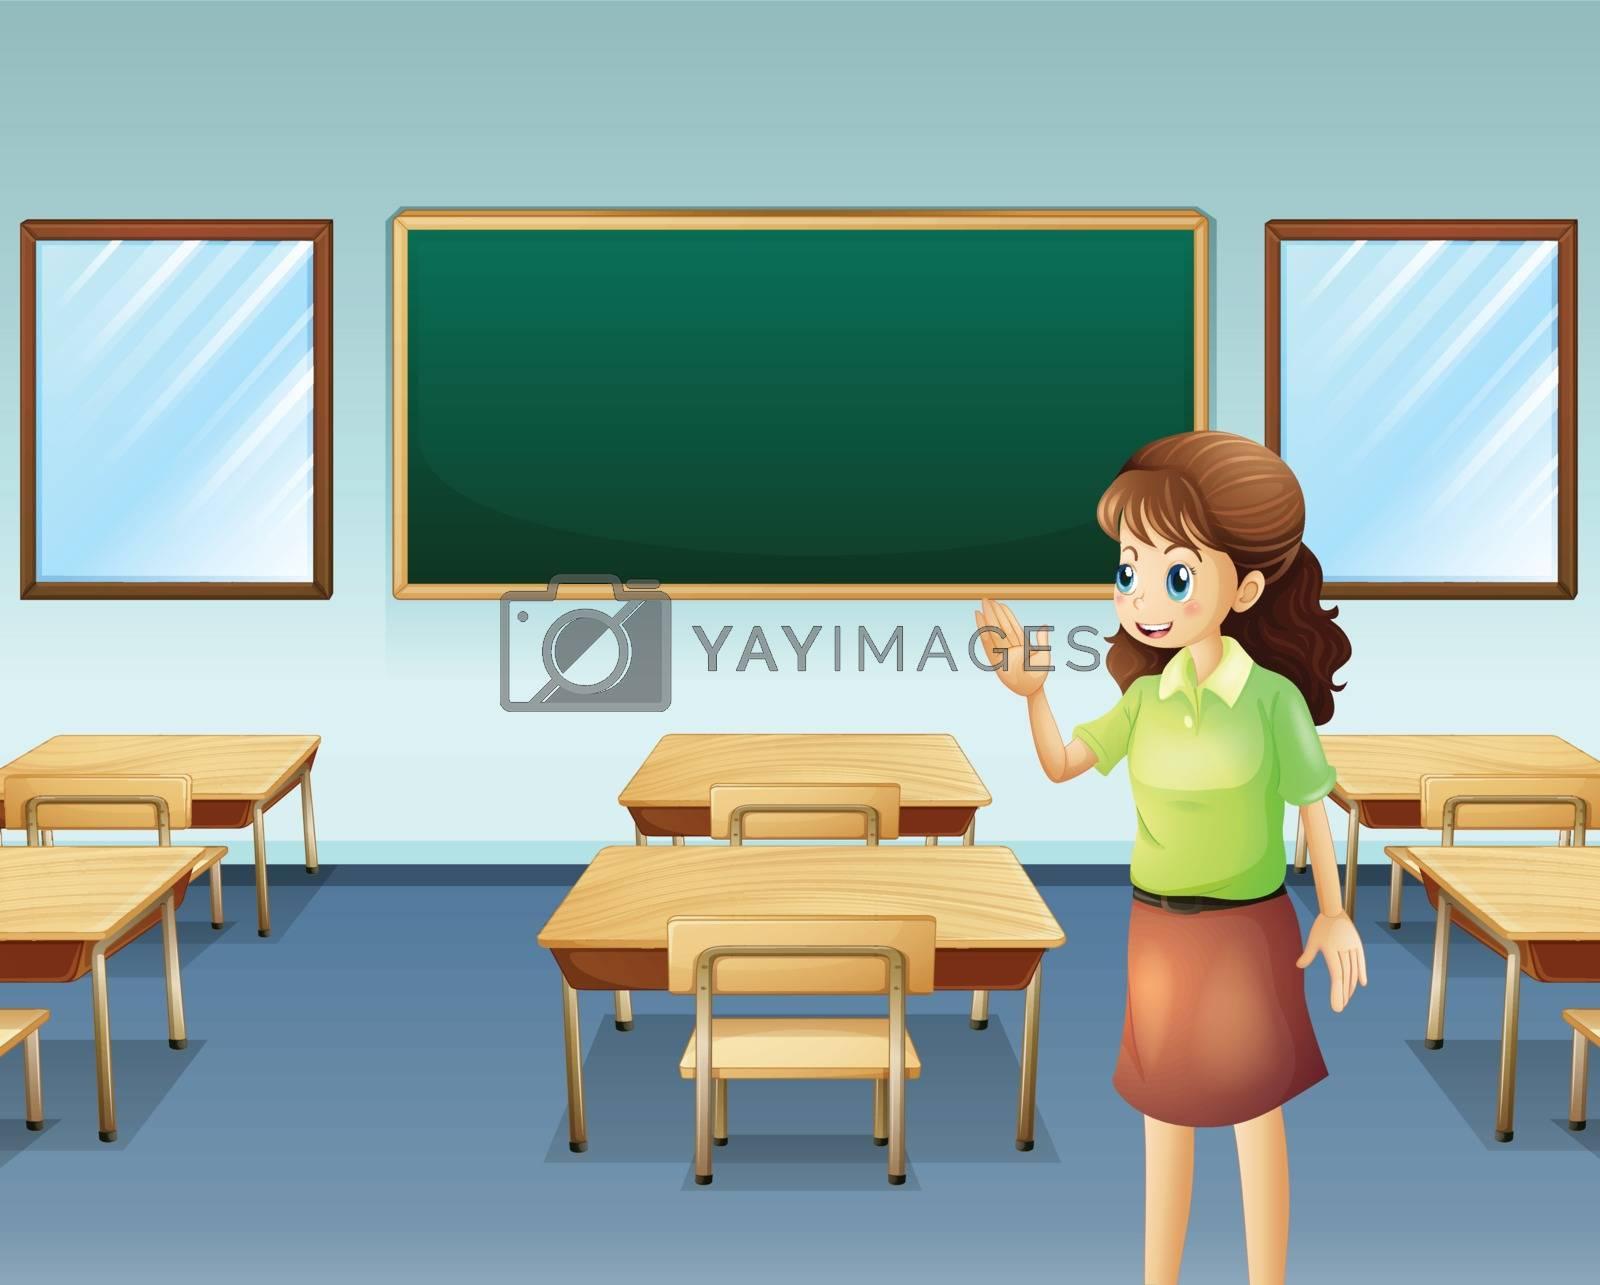 Illustration of a teacher inside the empty classroom